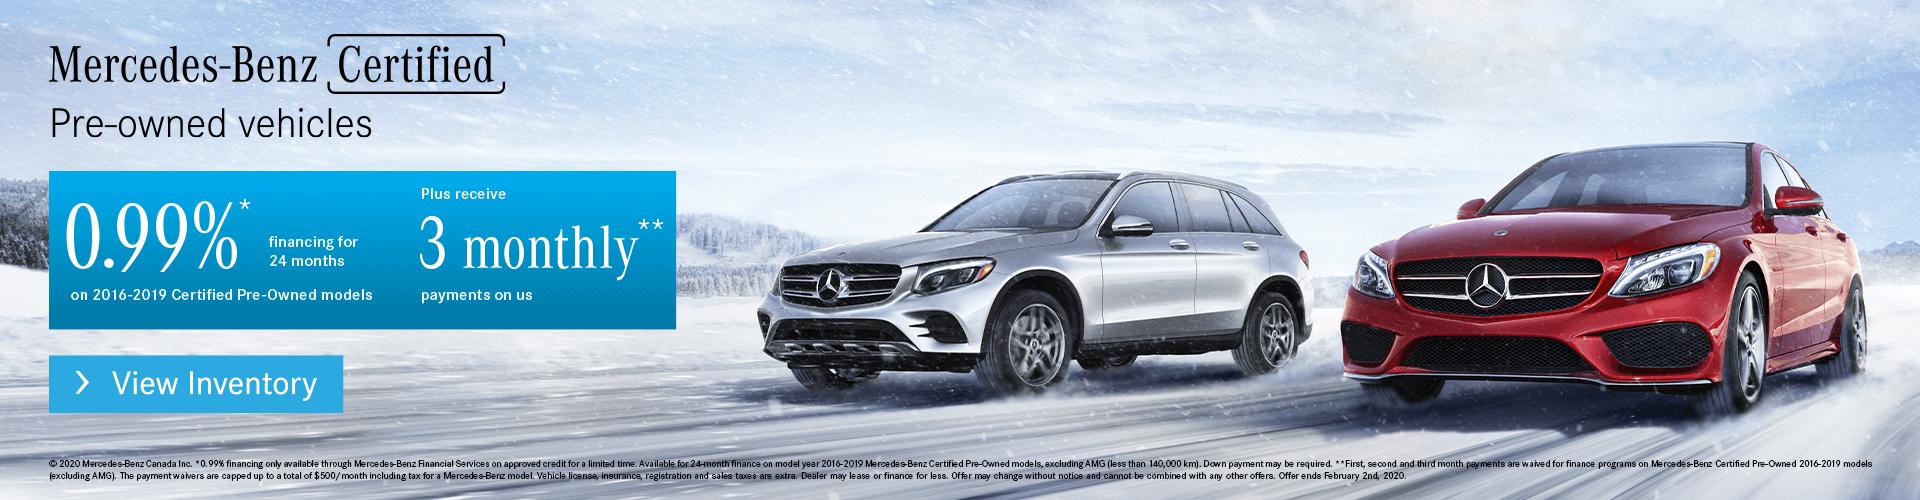 Mercedes-Benz Burlington Certified Pre-Owned Vehicles